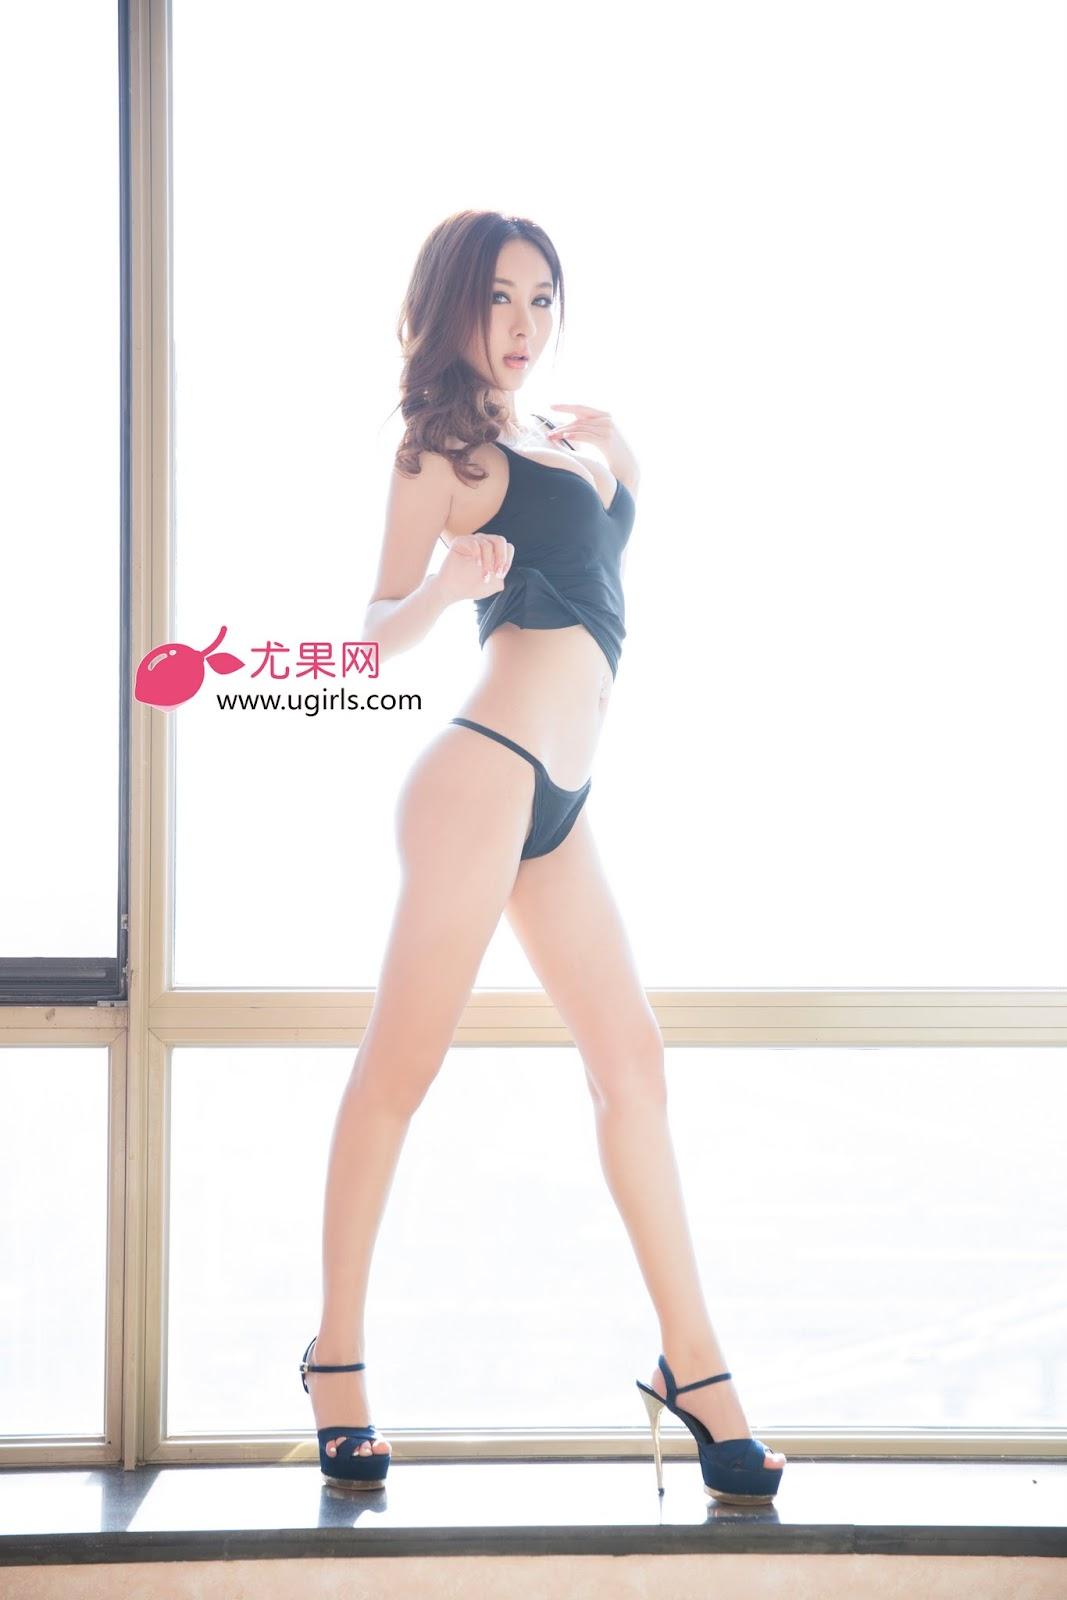 A14A6732 - Hot Photo UGIRLS NO.6 Nude Girl